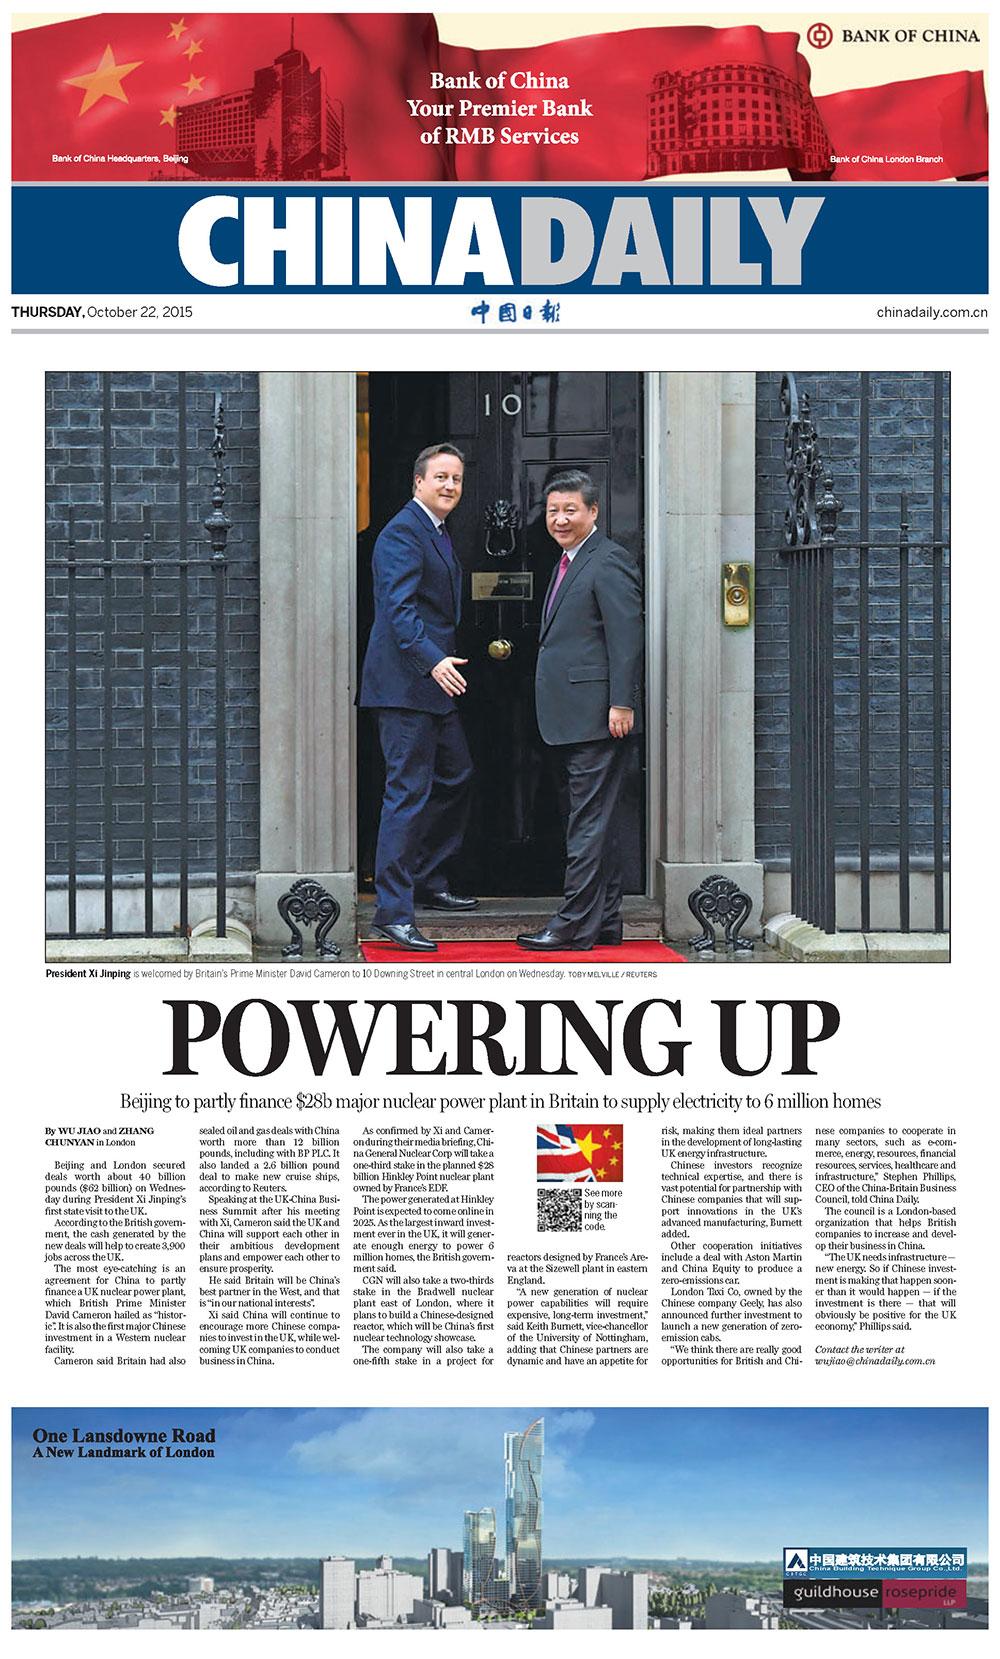 'China Daily,' European edition, October 22, 2015.